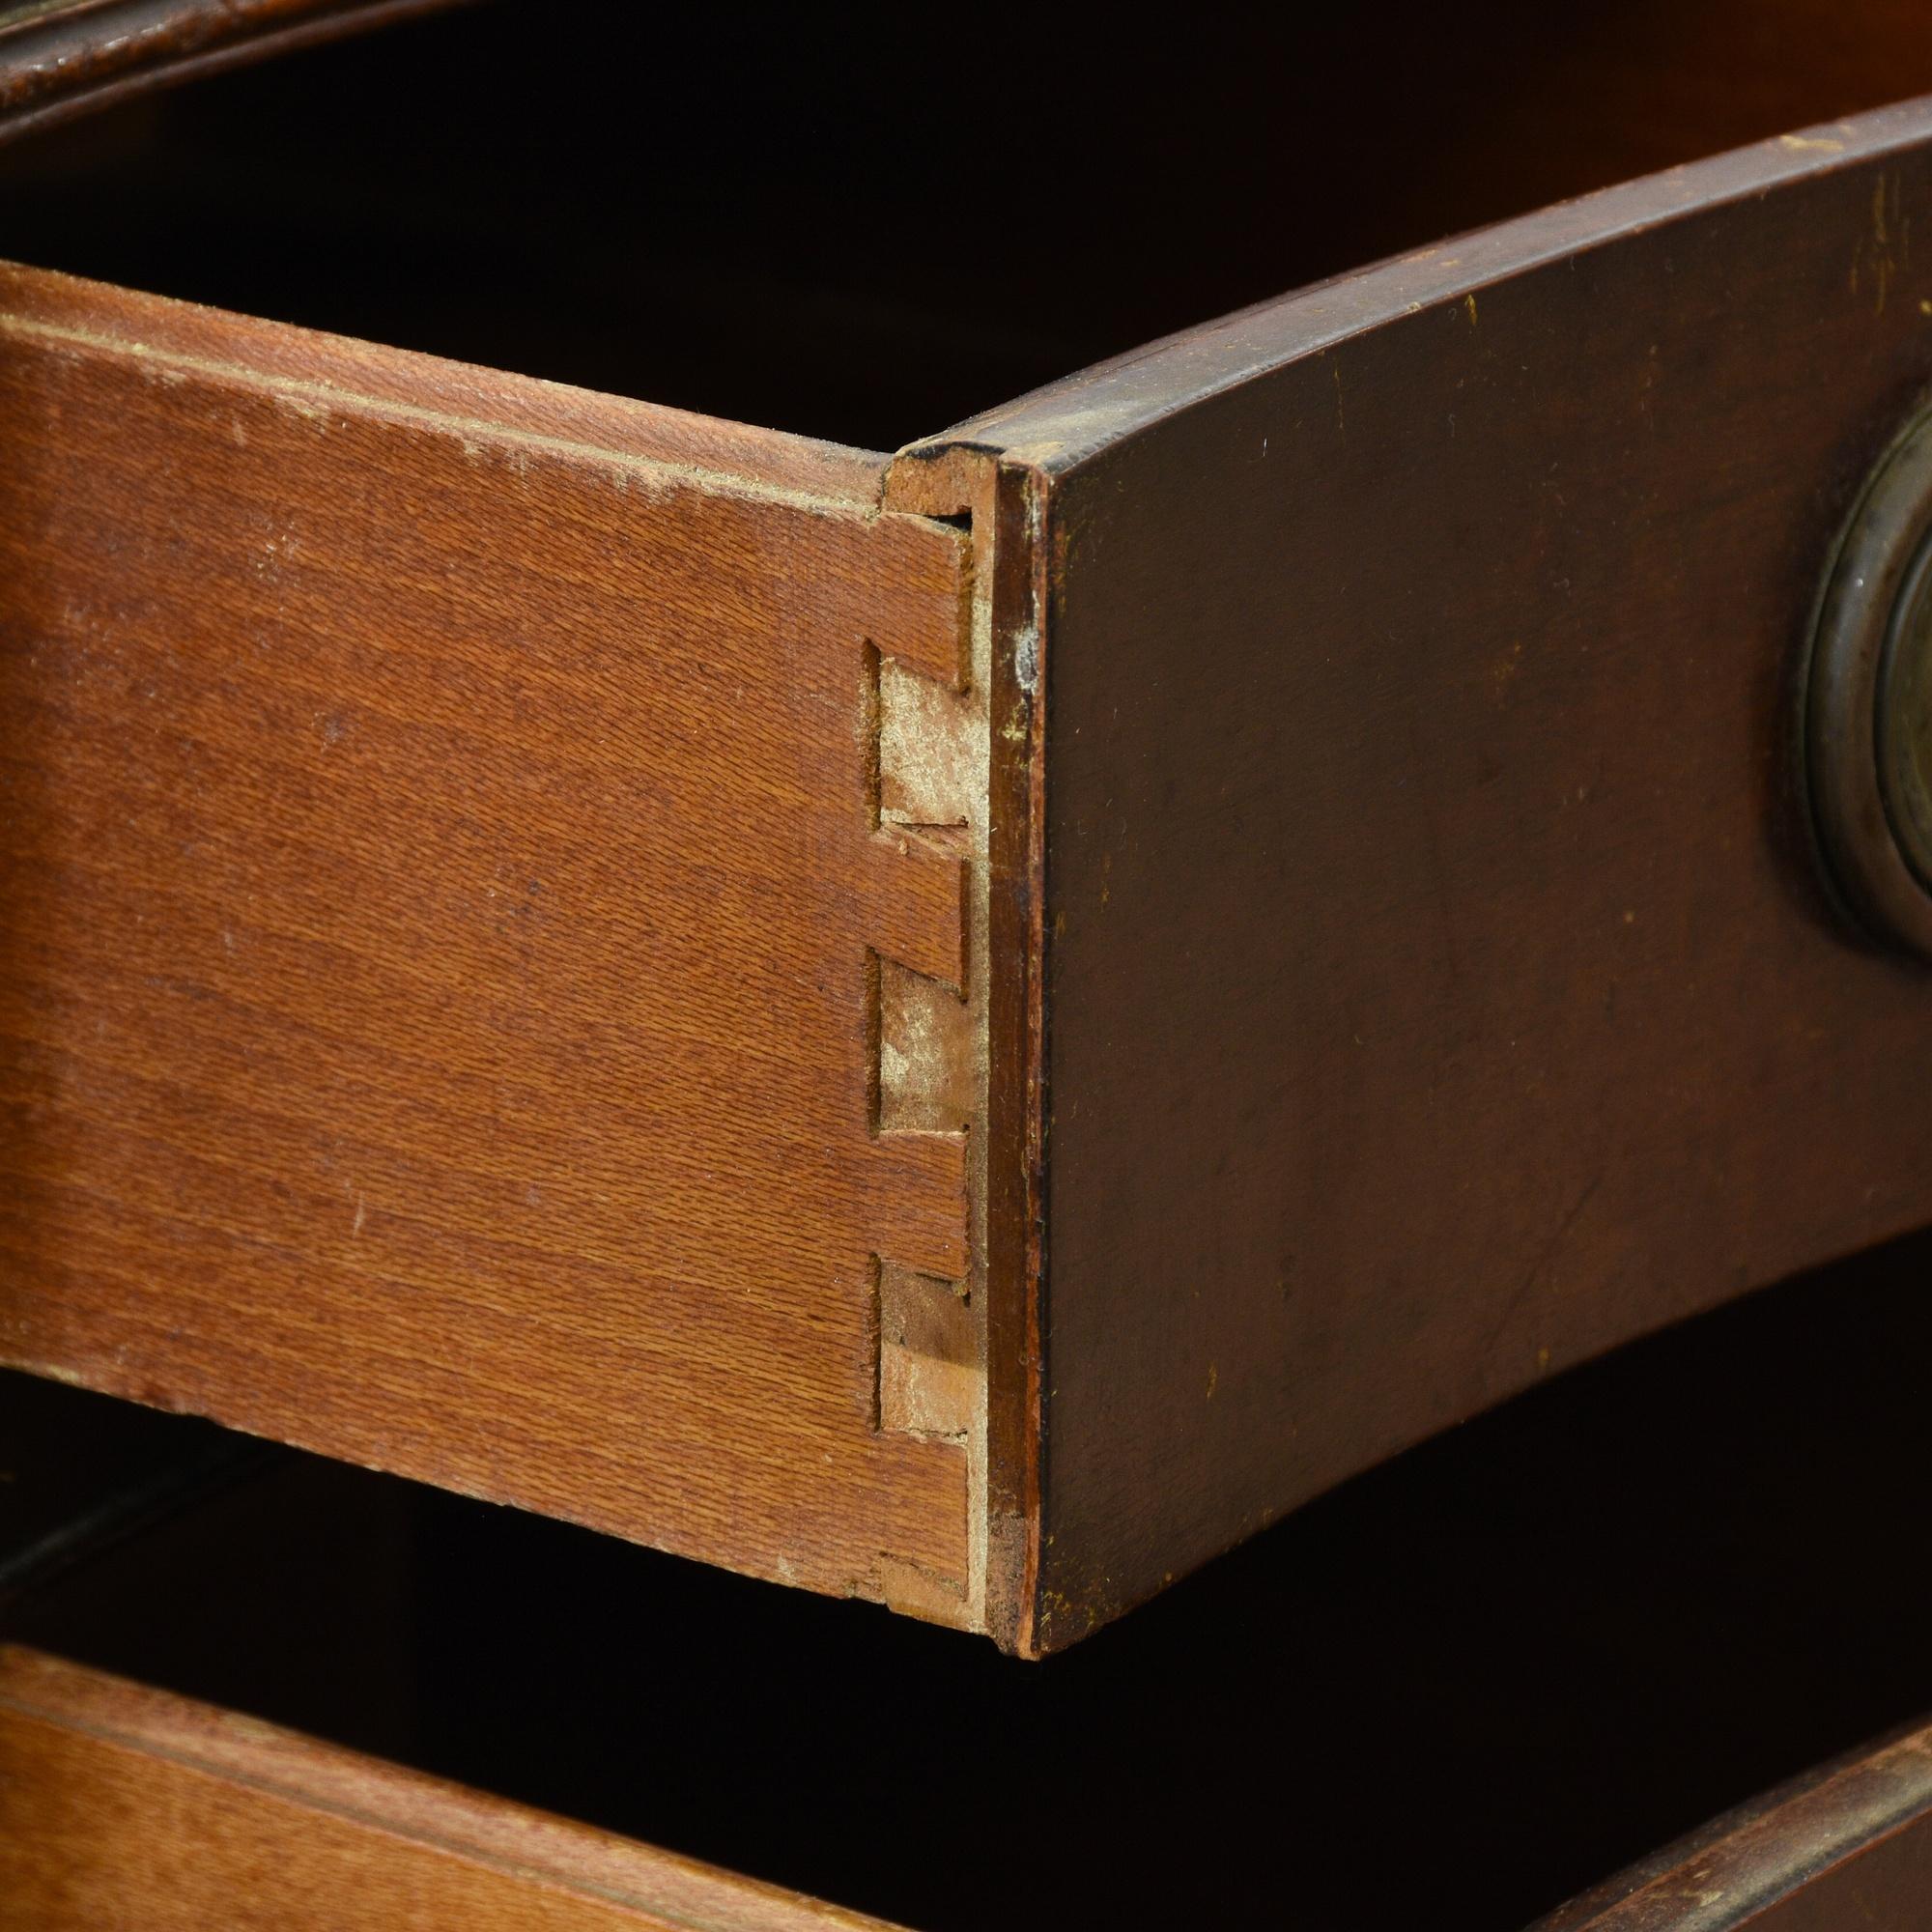 American Furniture Warehouse Desks ... Desk Vanity Table | Loveseat Vintage Furniture San Diego & Los Angeles